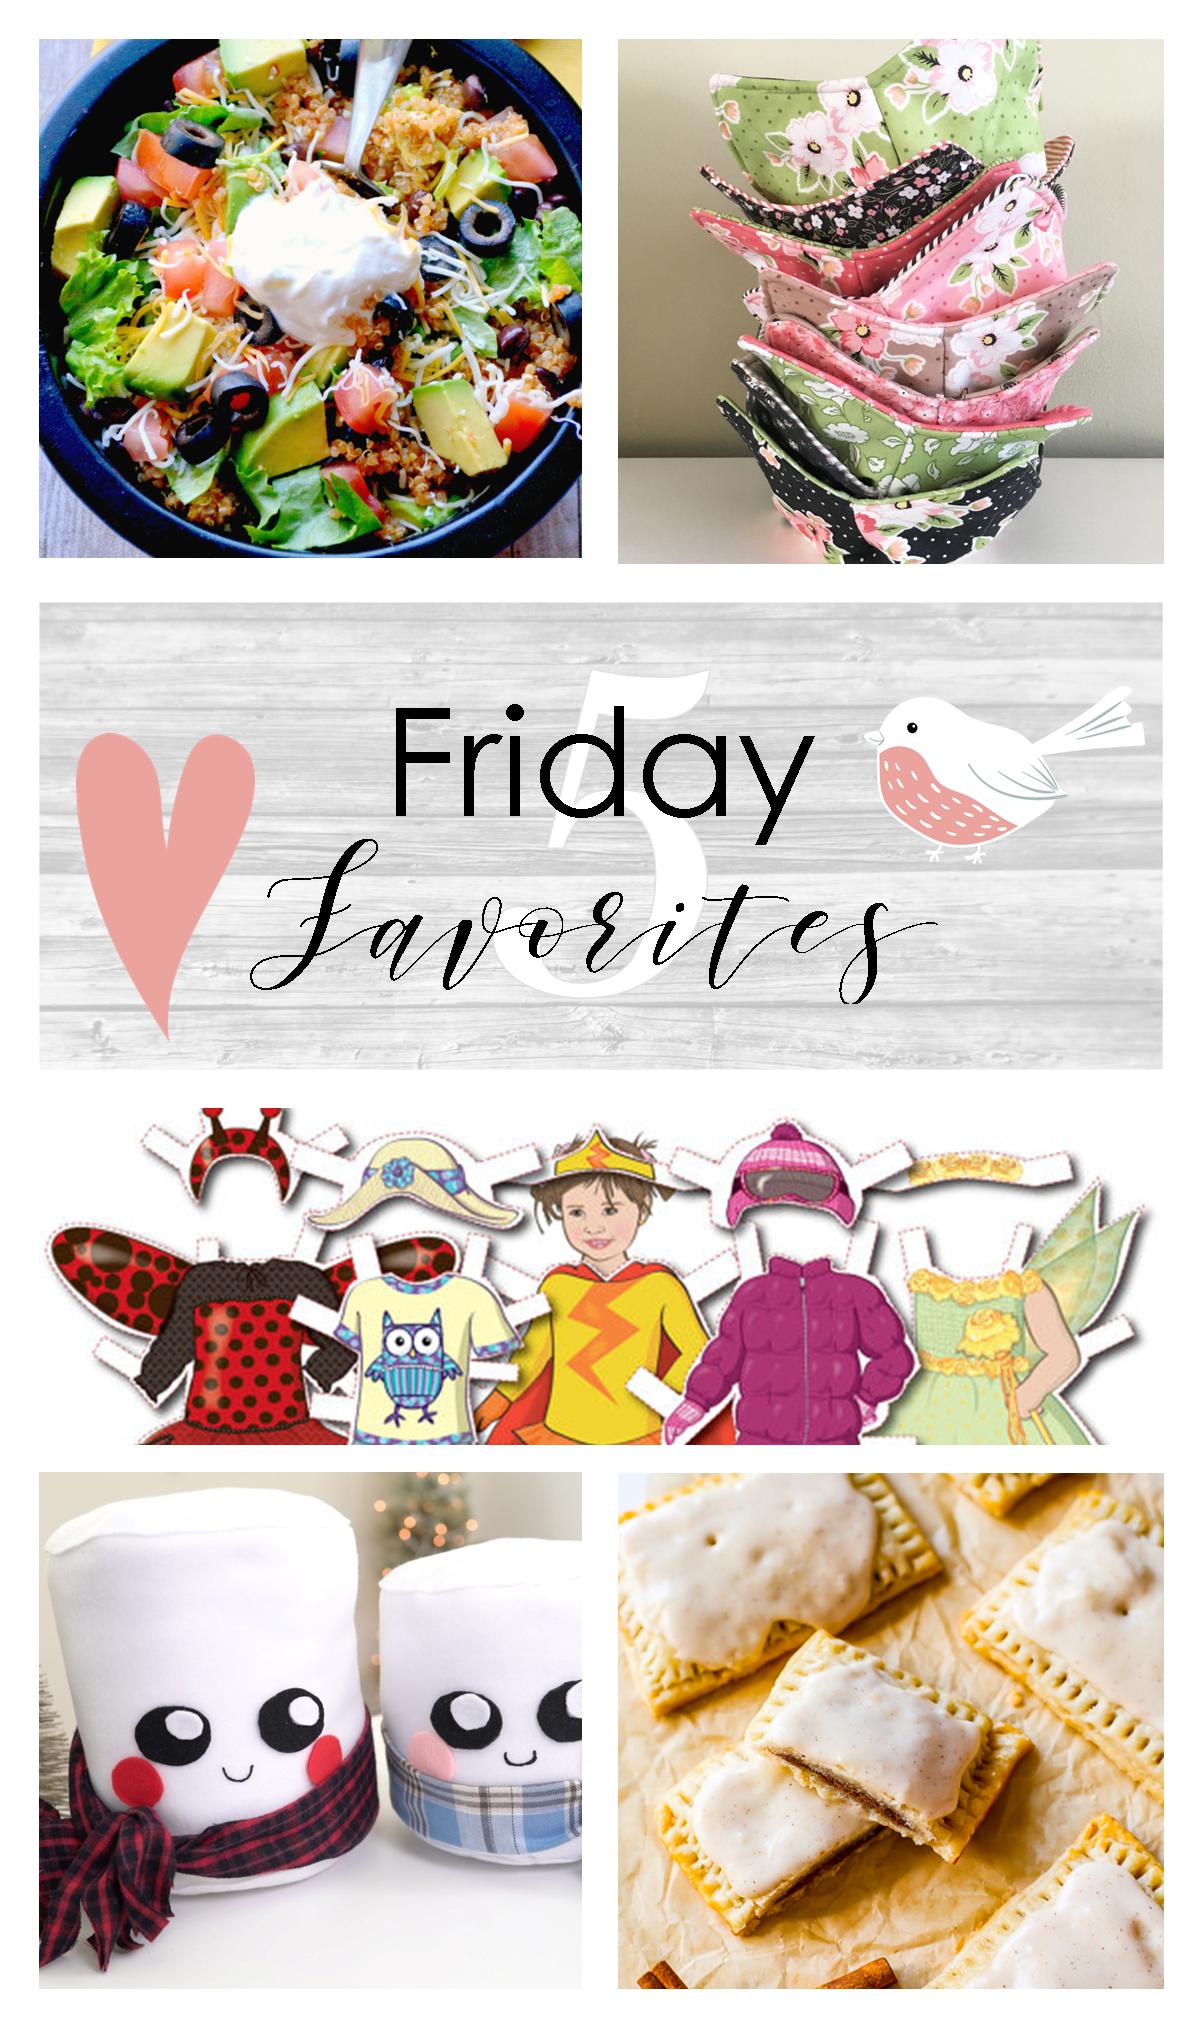 Friday Favorites 1.20.17